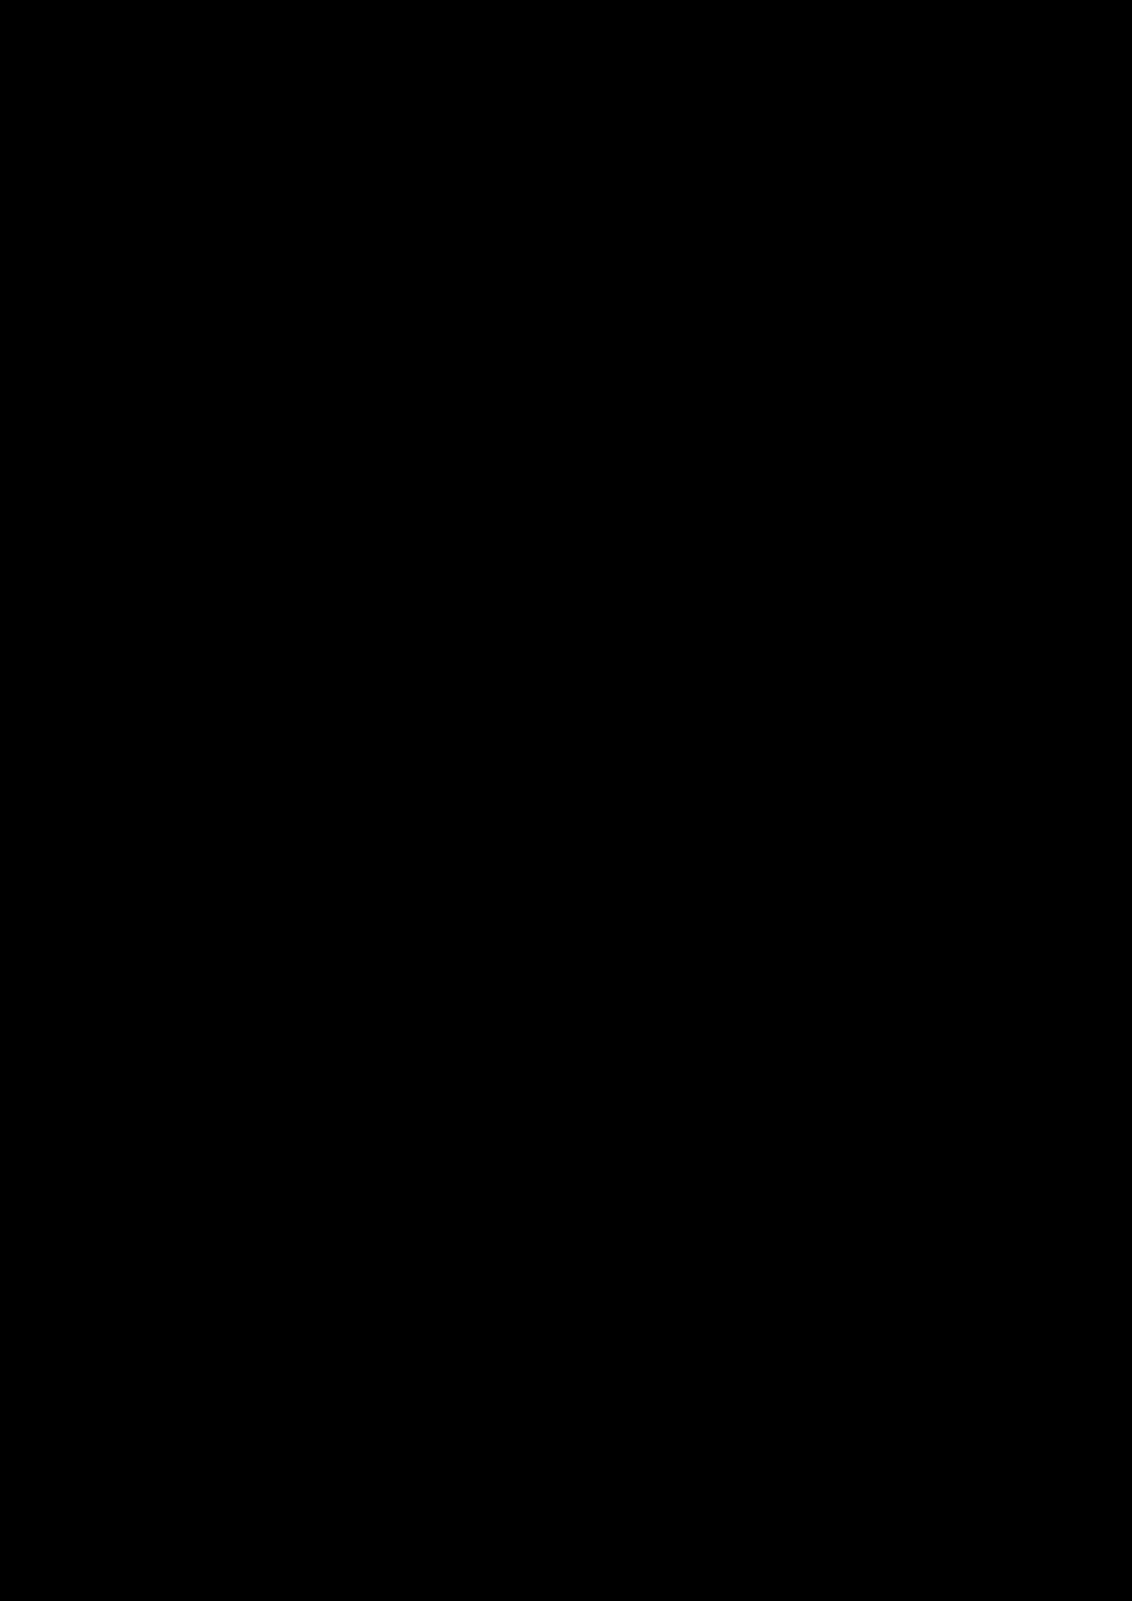 Ispoved Pervogo Boga slide, Image 23